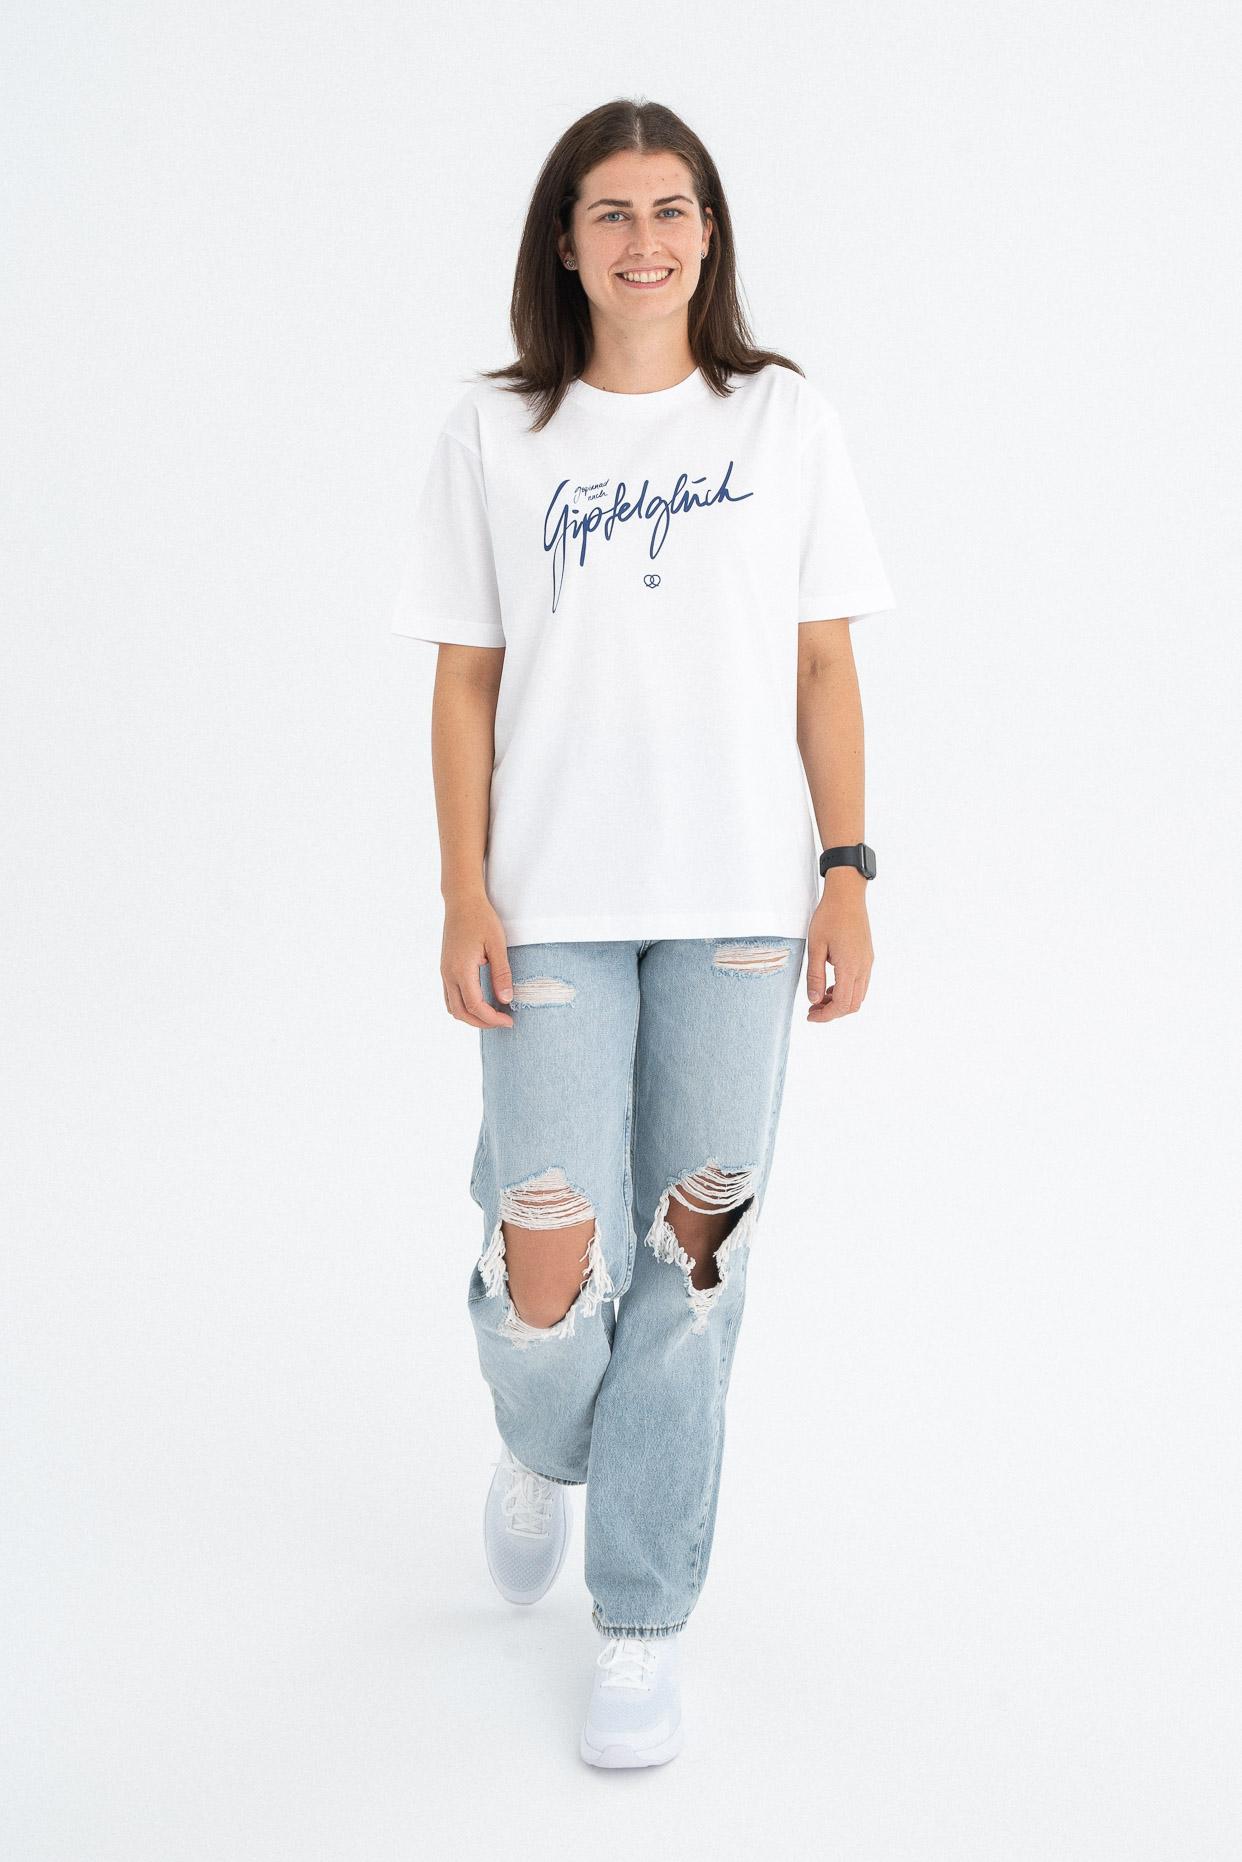 Gipfelglück Shirt